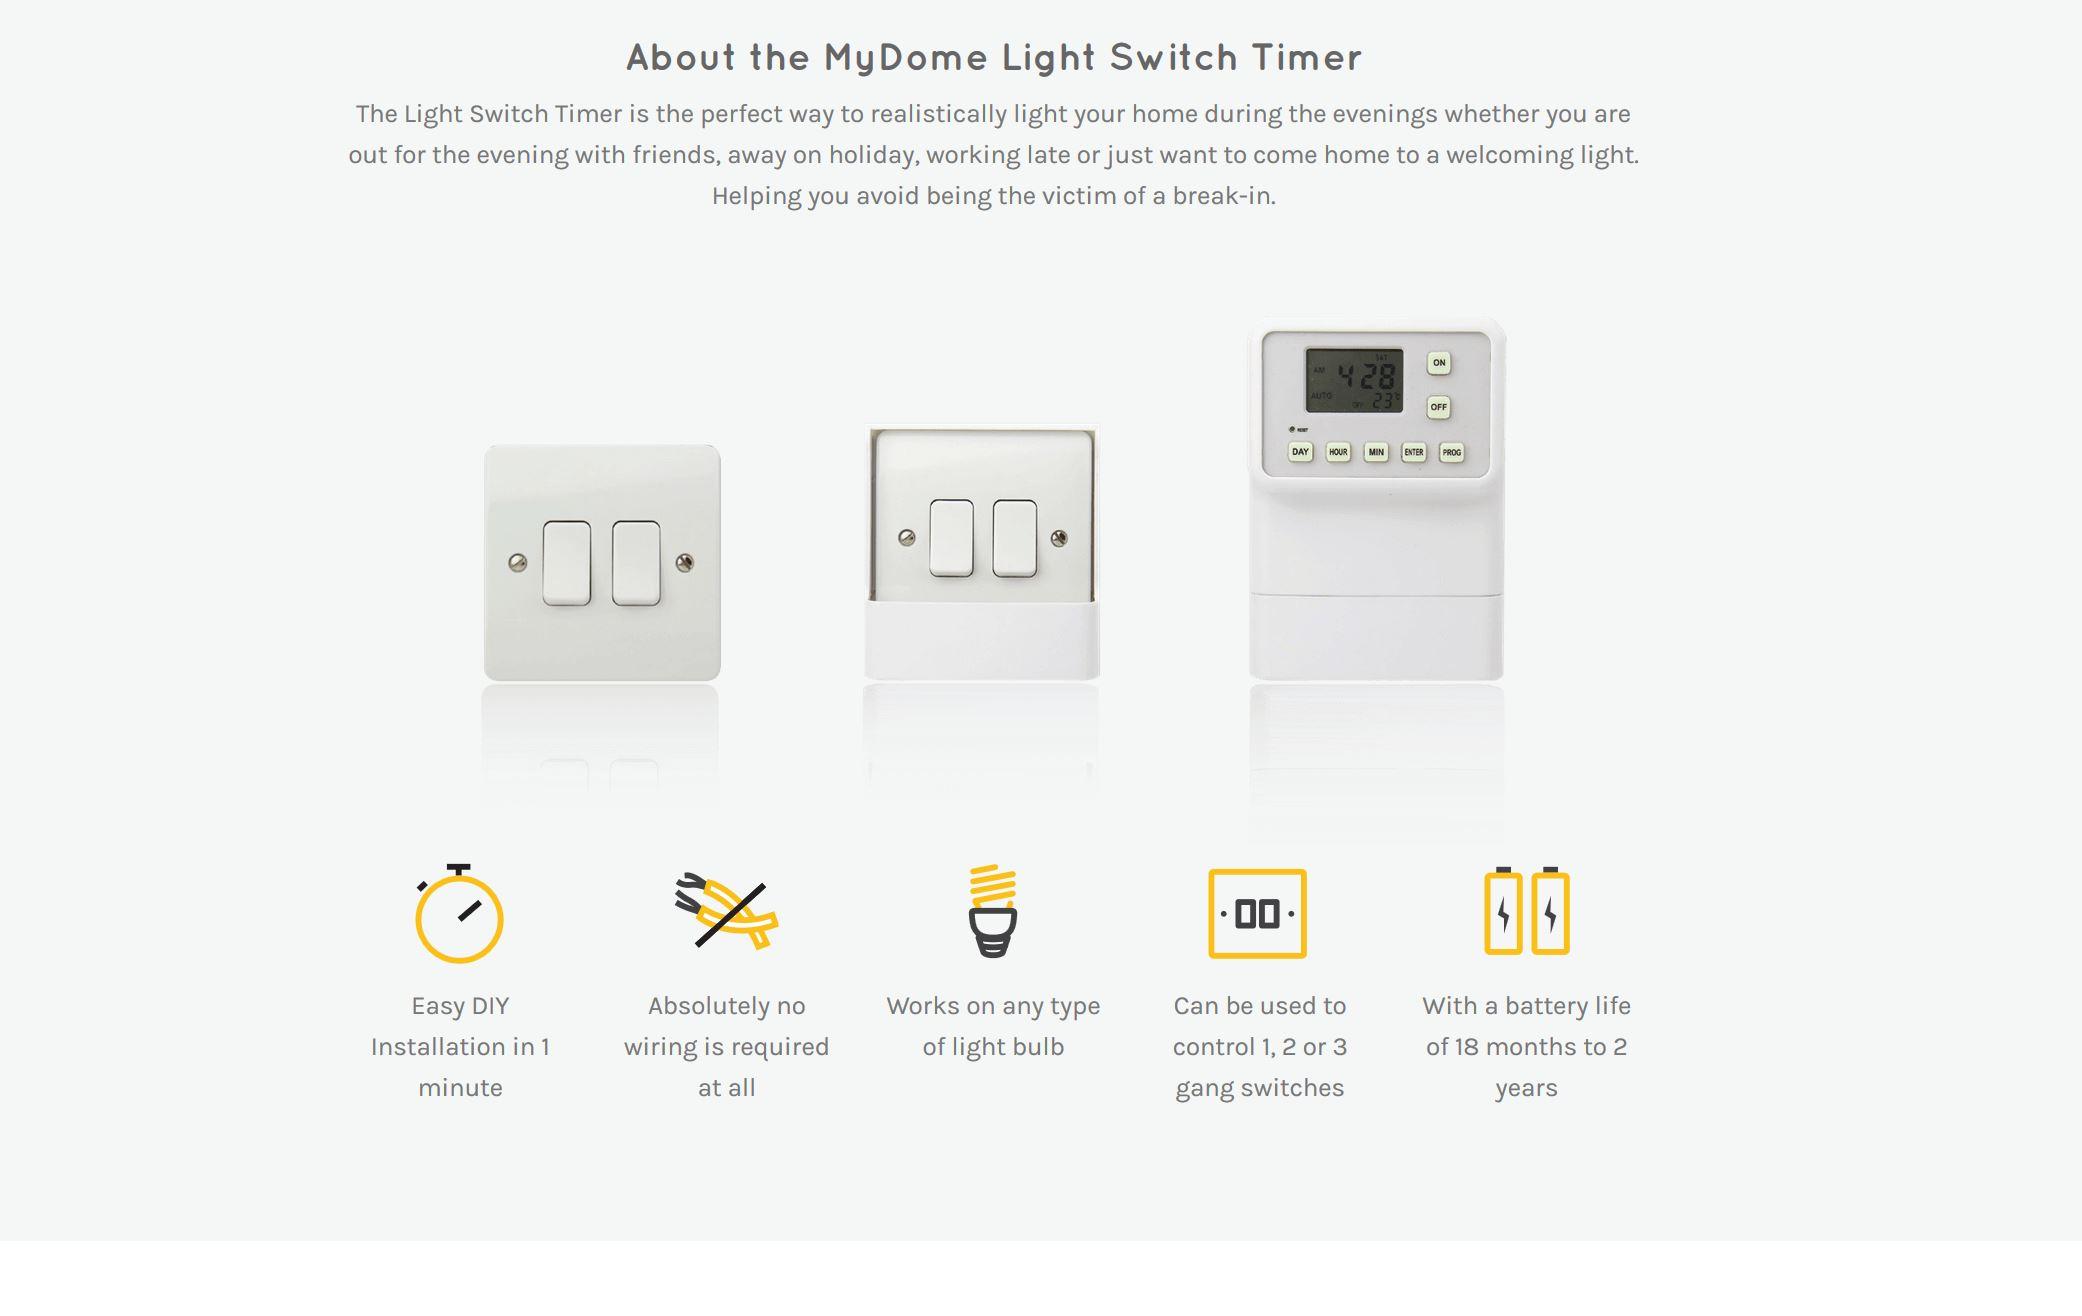 MyDome Light Switch Timer